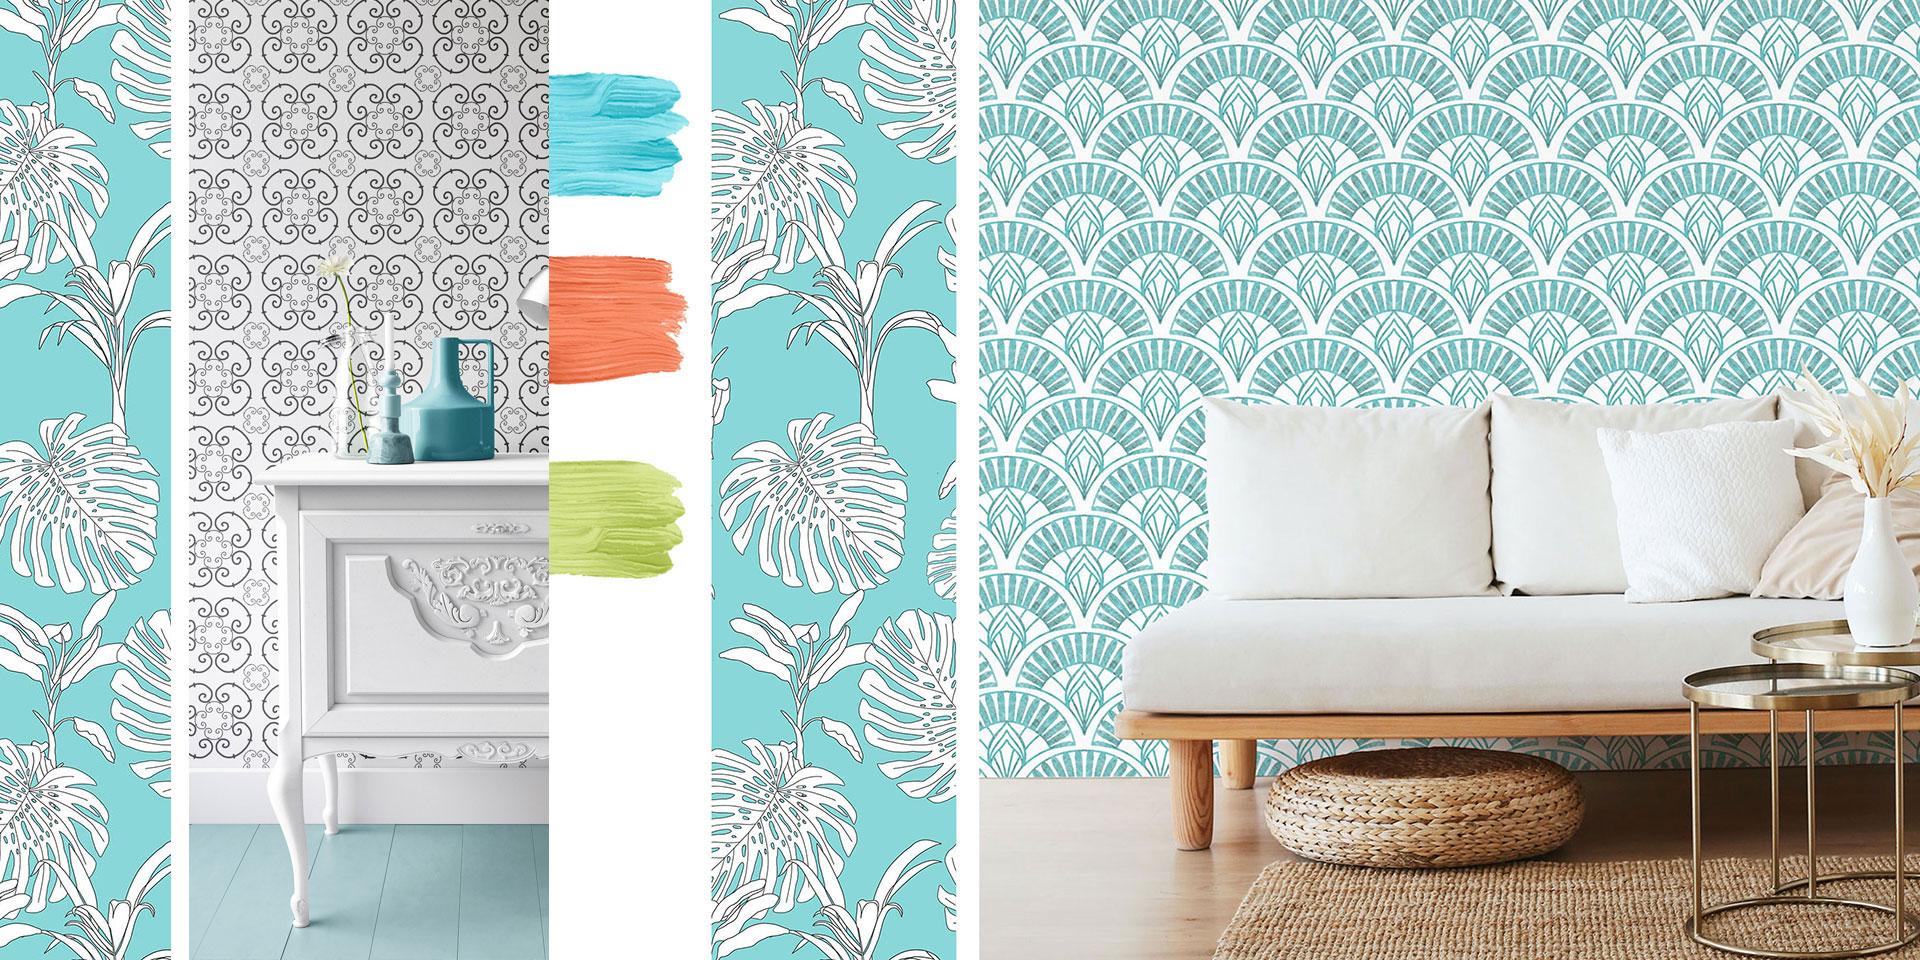 tapeta, hampton style, coastal style, wallpaper, niebieska tapeta,kolekcja tapet, patternosophy